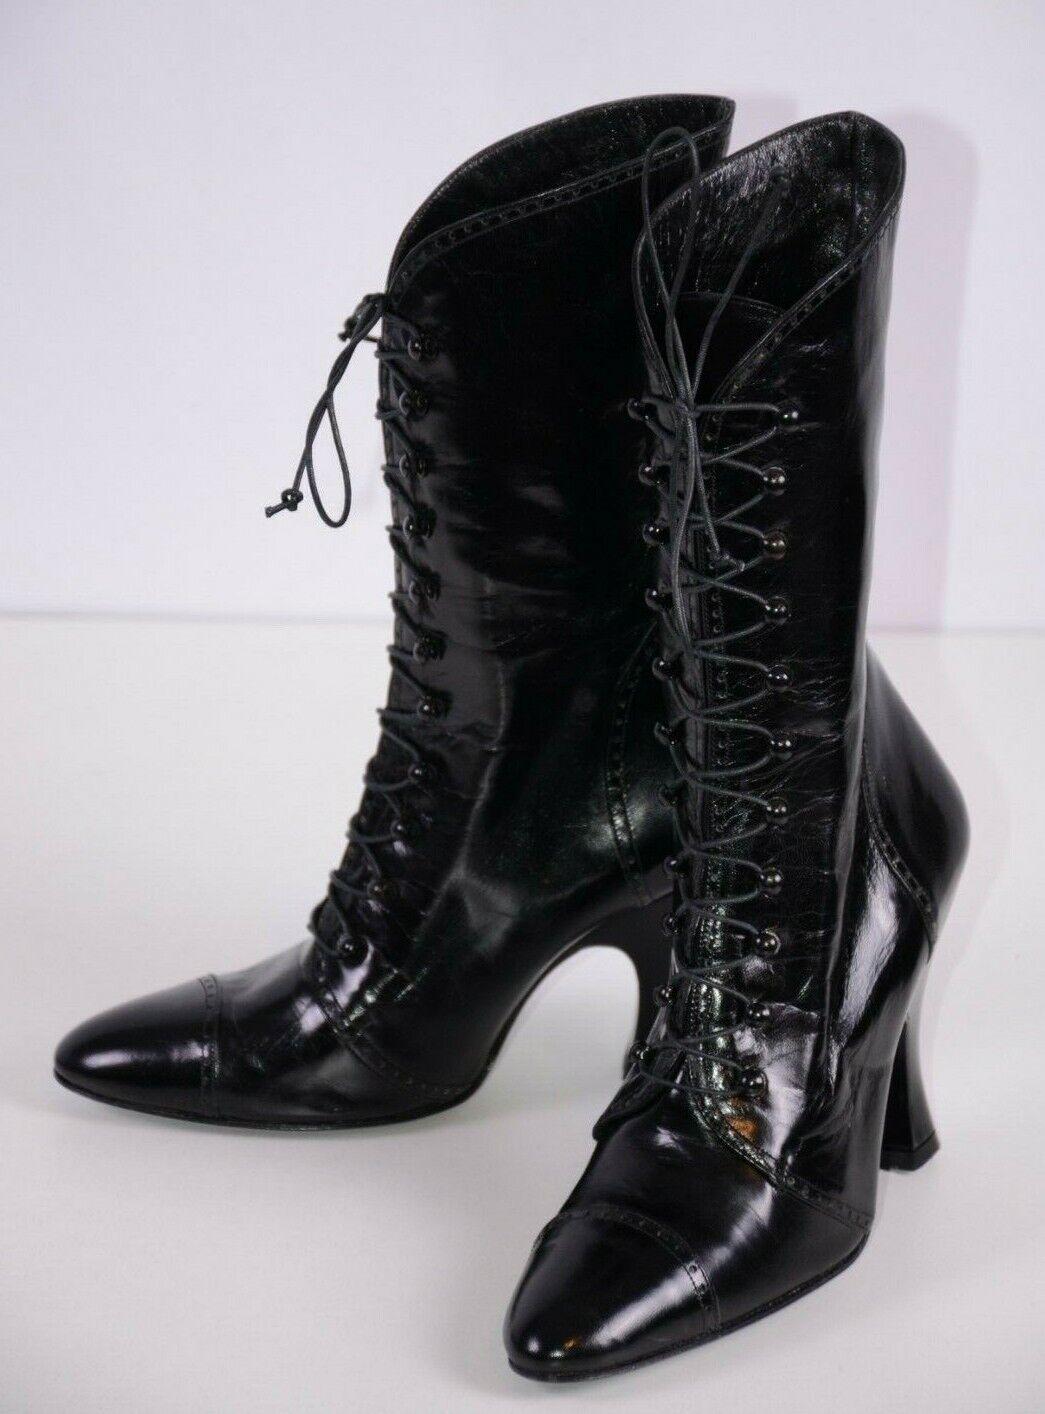 Norma Kamali Women's Lace Up Boots Size 7B Black Lacquered Kitten Heel Steampunk